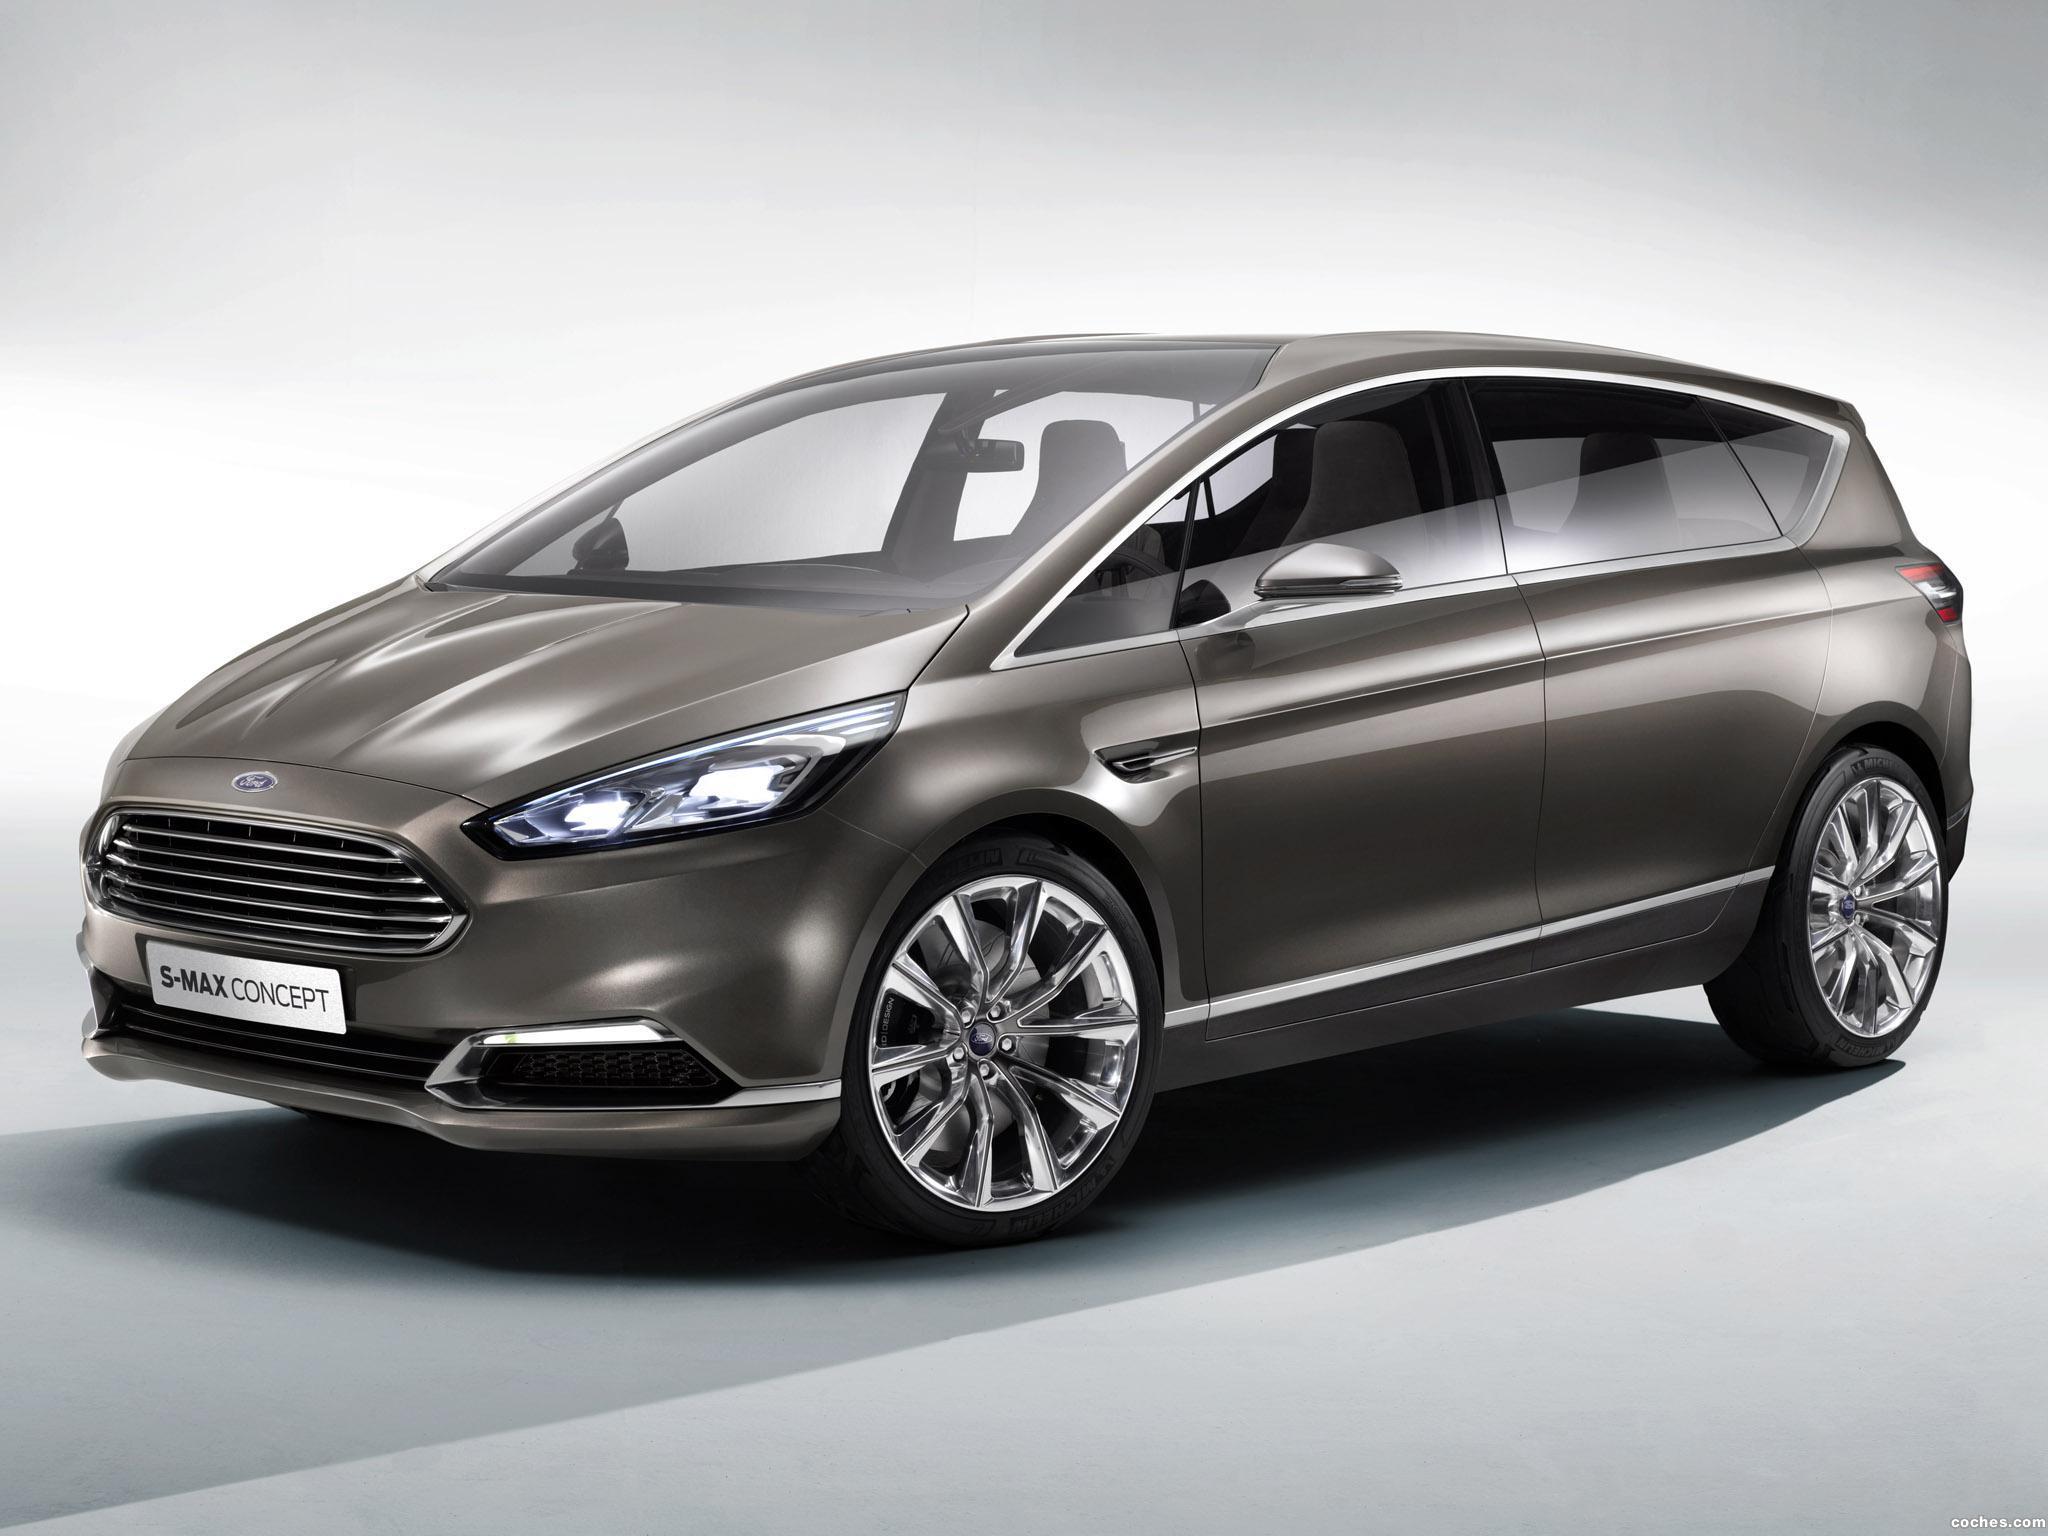 Foto 0 de Ford S-MAX Concept 2013